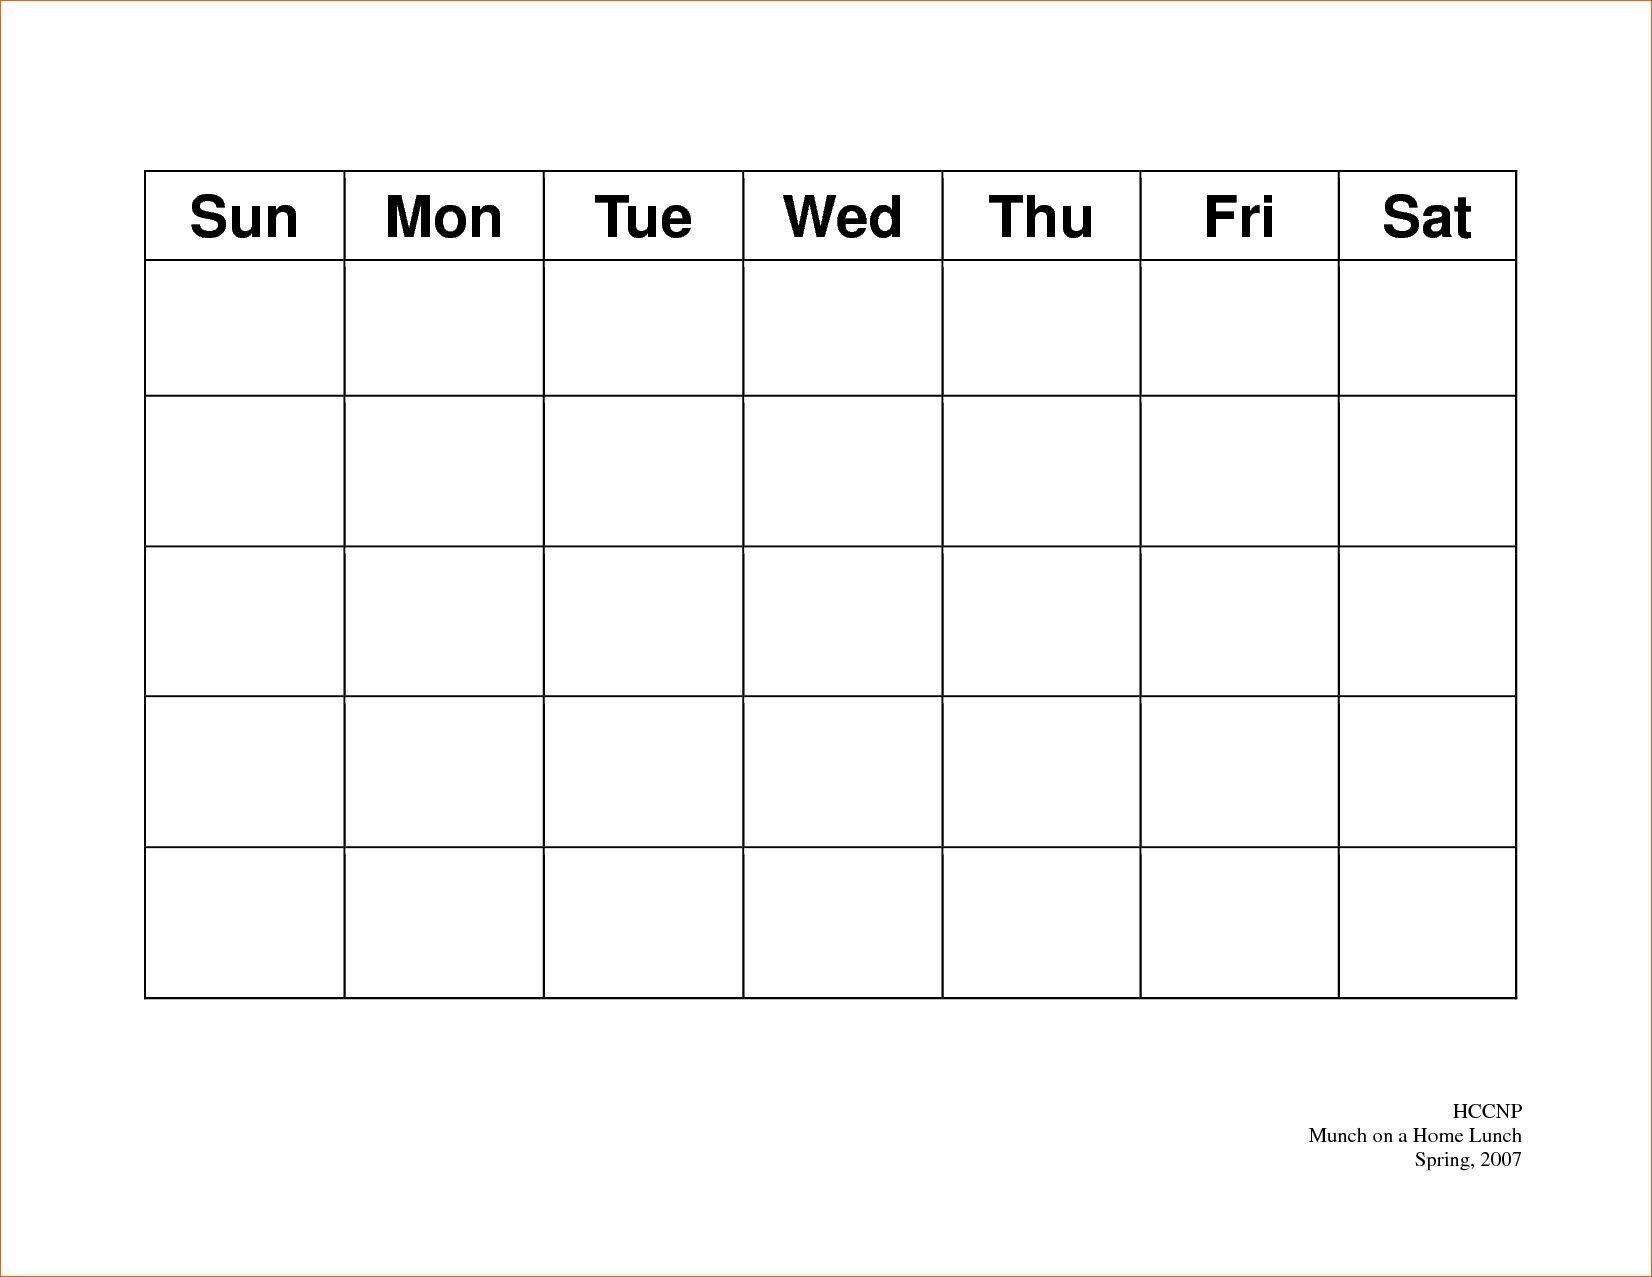 Calendar 5 Day Weekly Calendar Template On 5 Week Calendar-5 Day Calendar Template